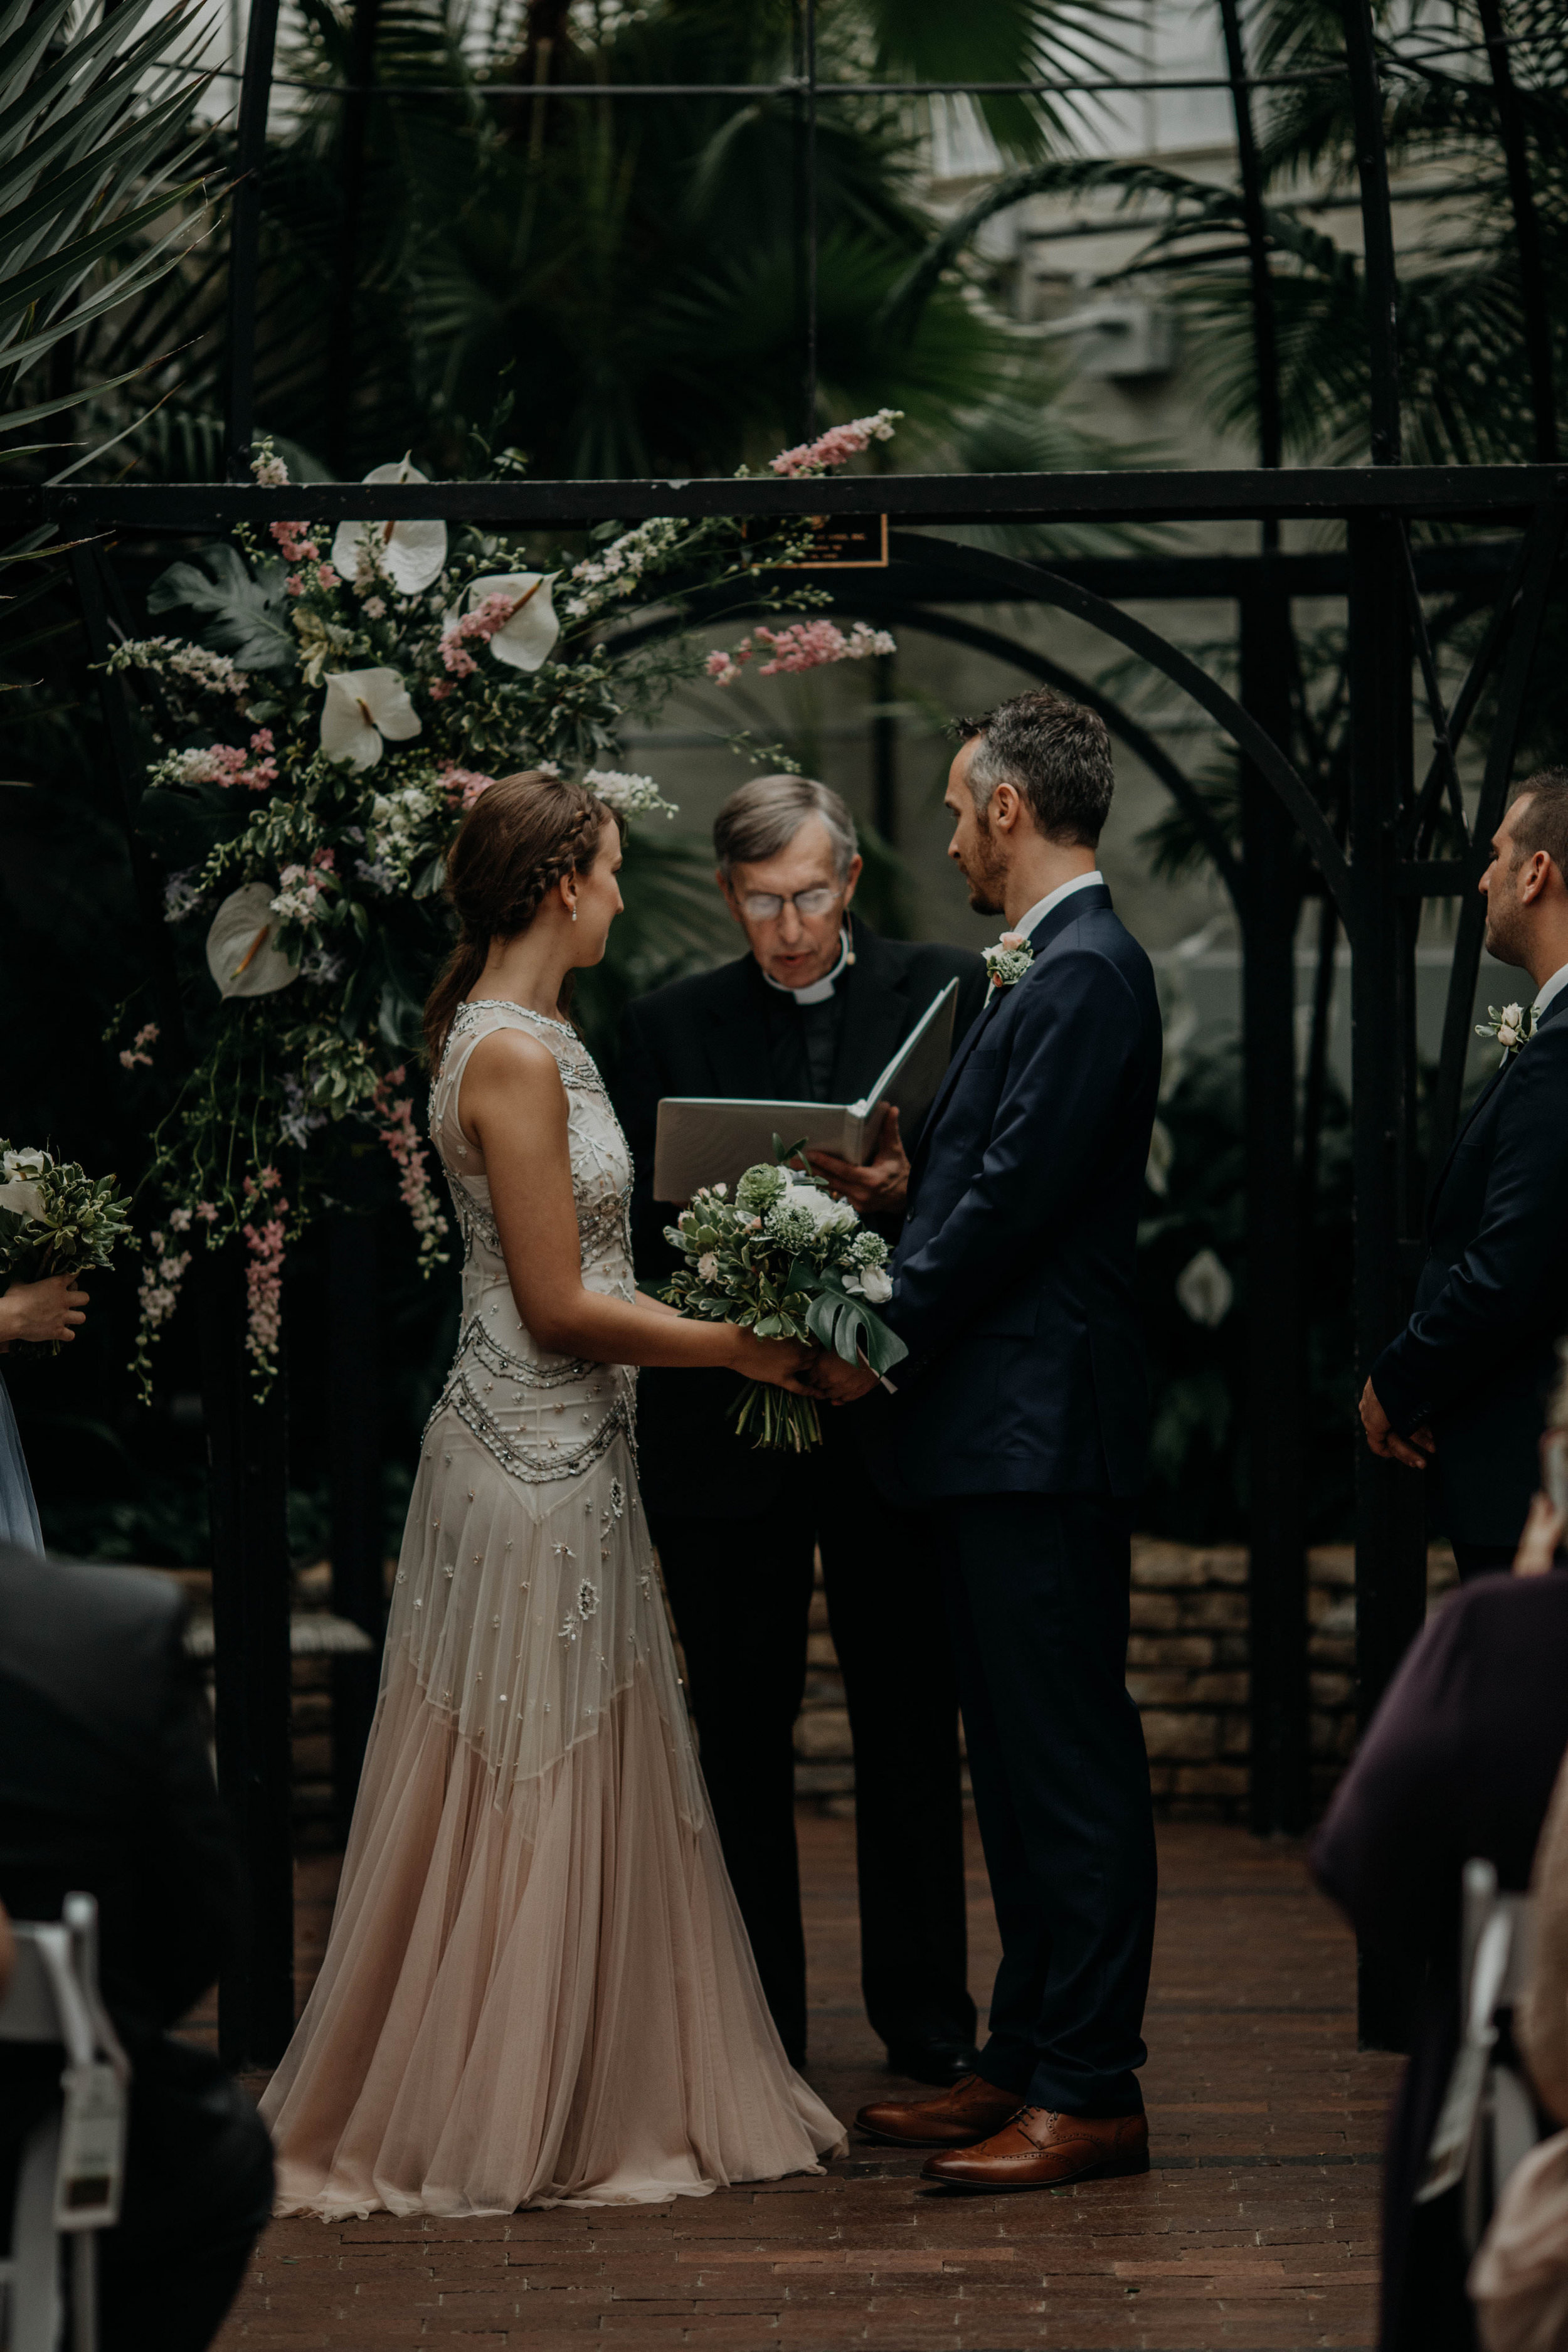 franklin park conservatory wedding columbus ohio wedding photographer grace e jones photography238.jpg